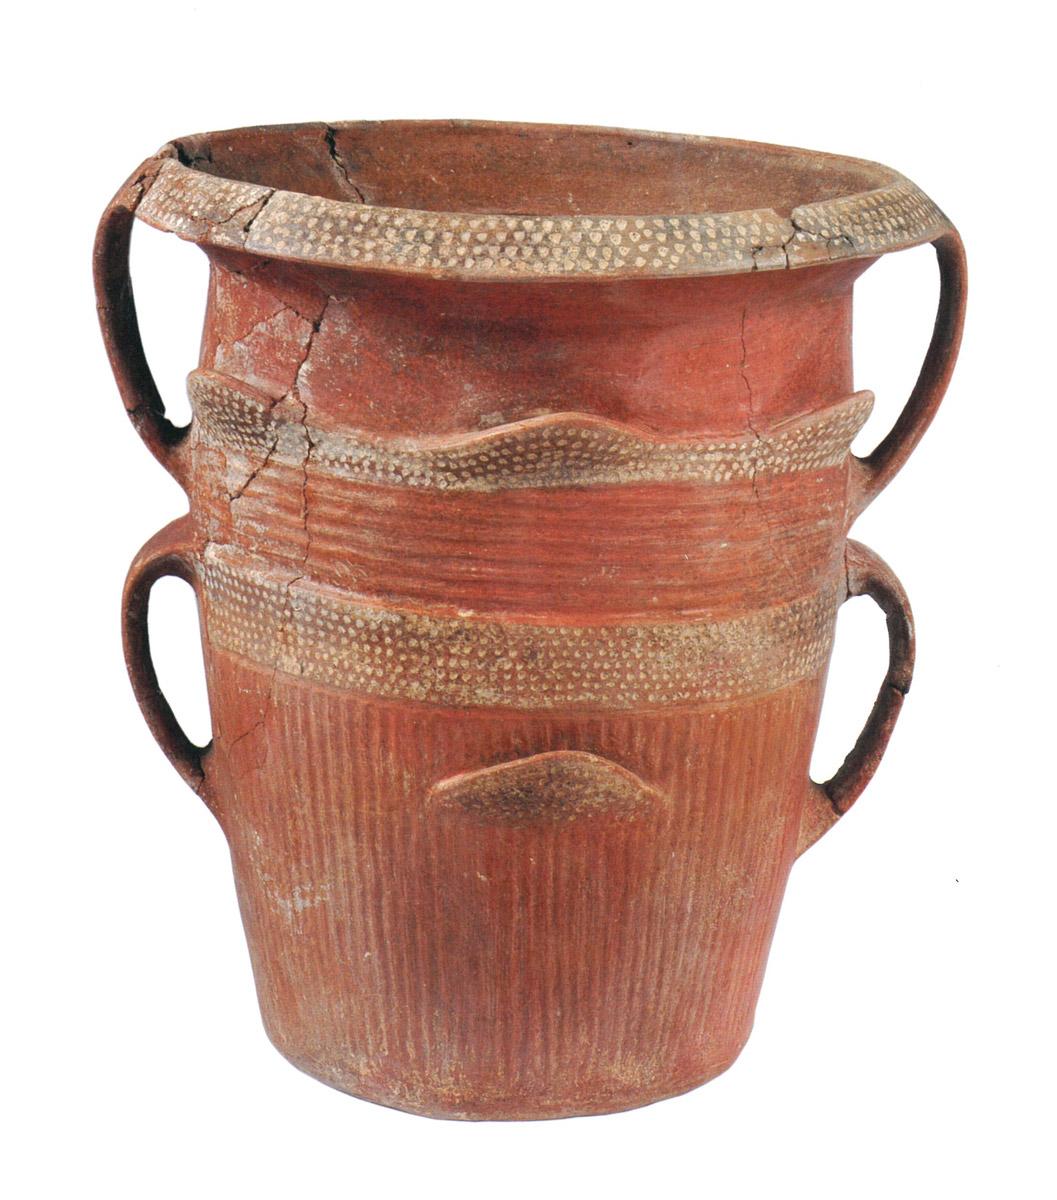 Località Gannì (CA), tomba I, camera T2: vaso situliforme (Anas, L'archeologia si fa strada. Scavi, scoperte e tesori lungo le vie d'Italia, 2017)